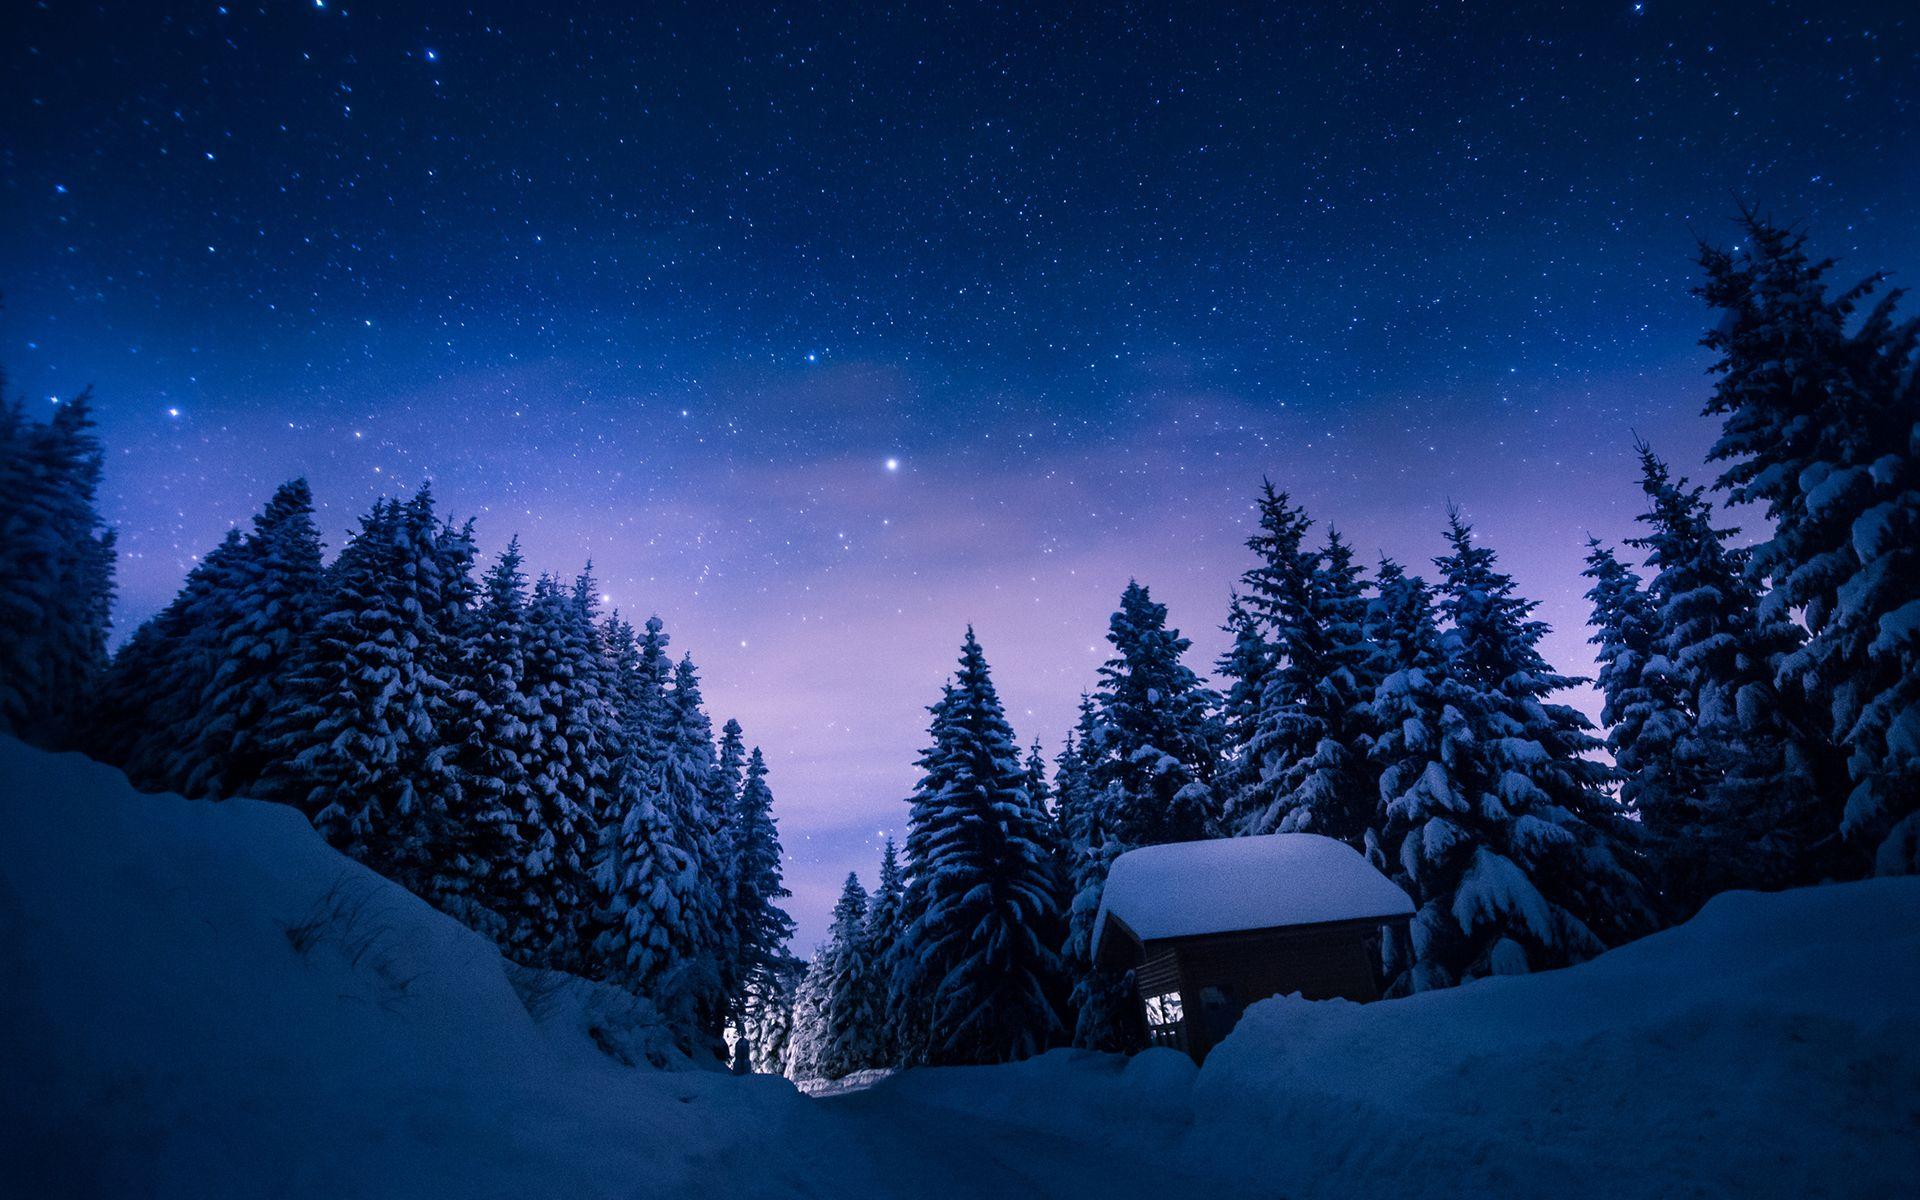 Trees Snow Winter Night Stars Cabin Path Trail Trees Sky